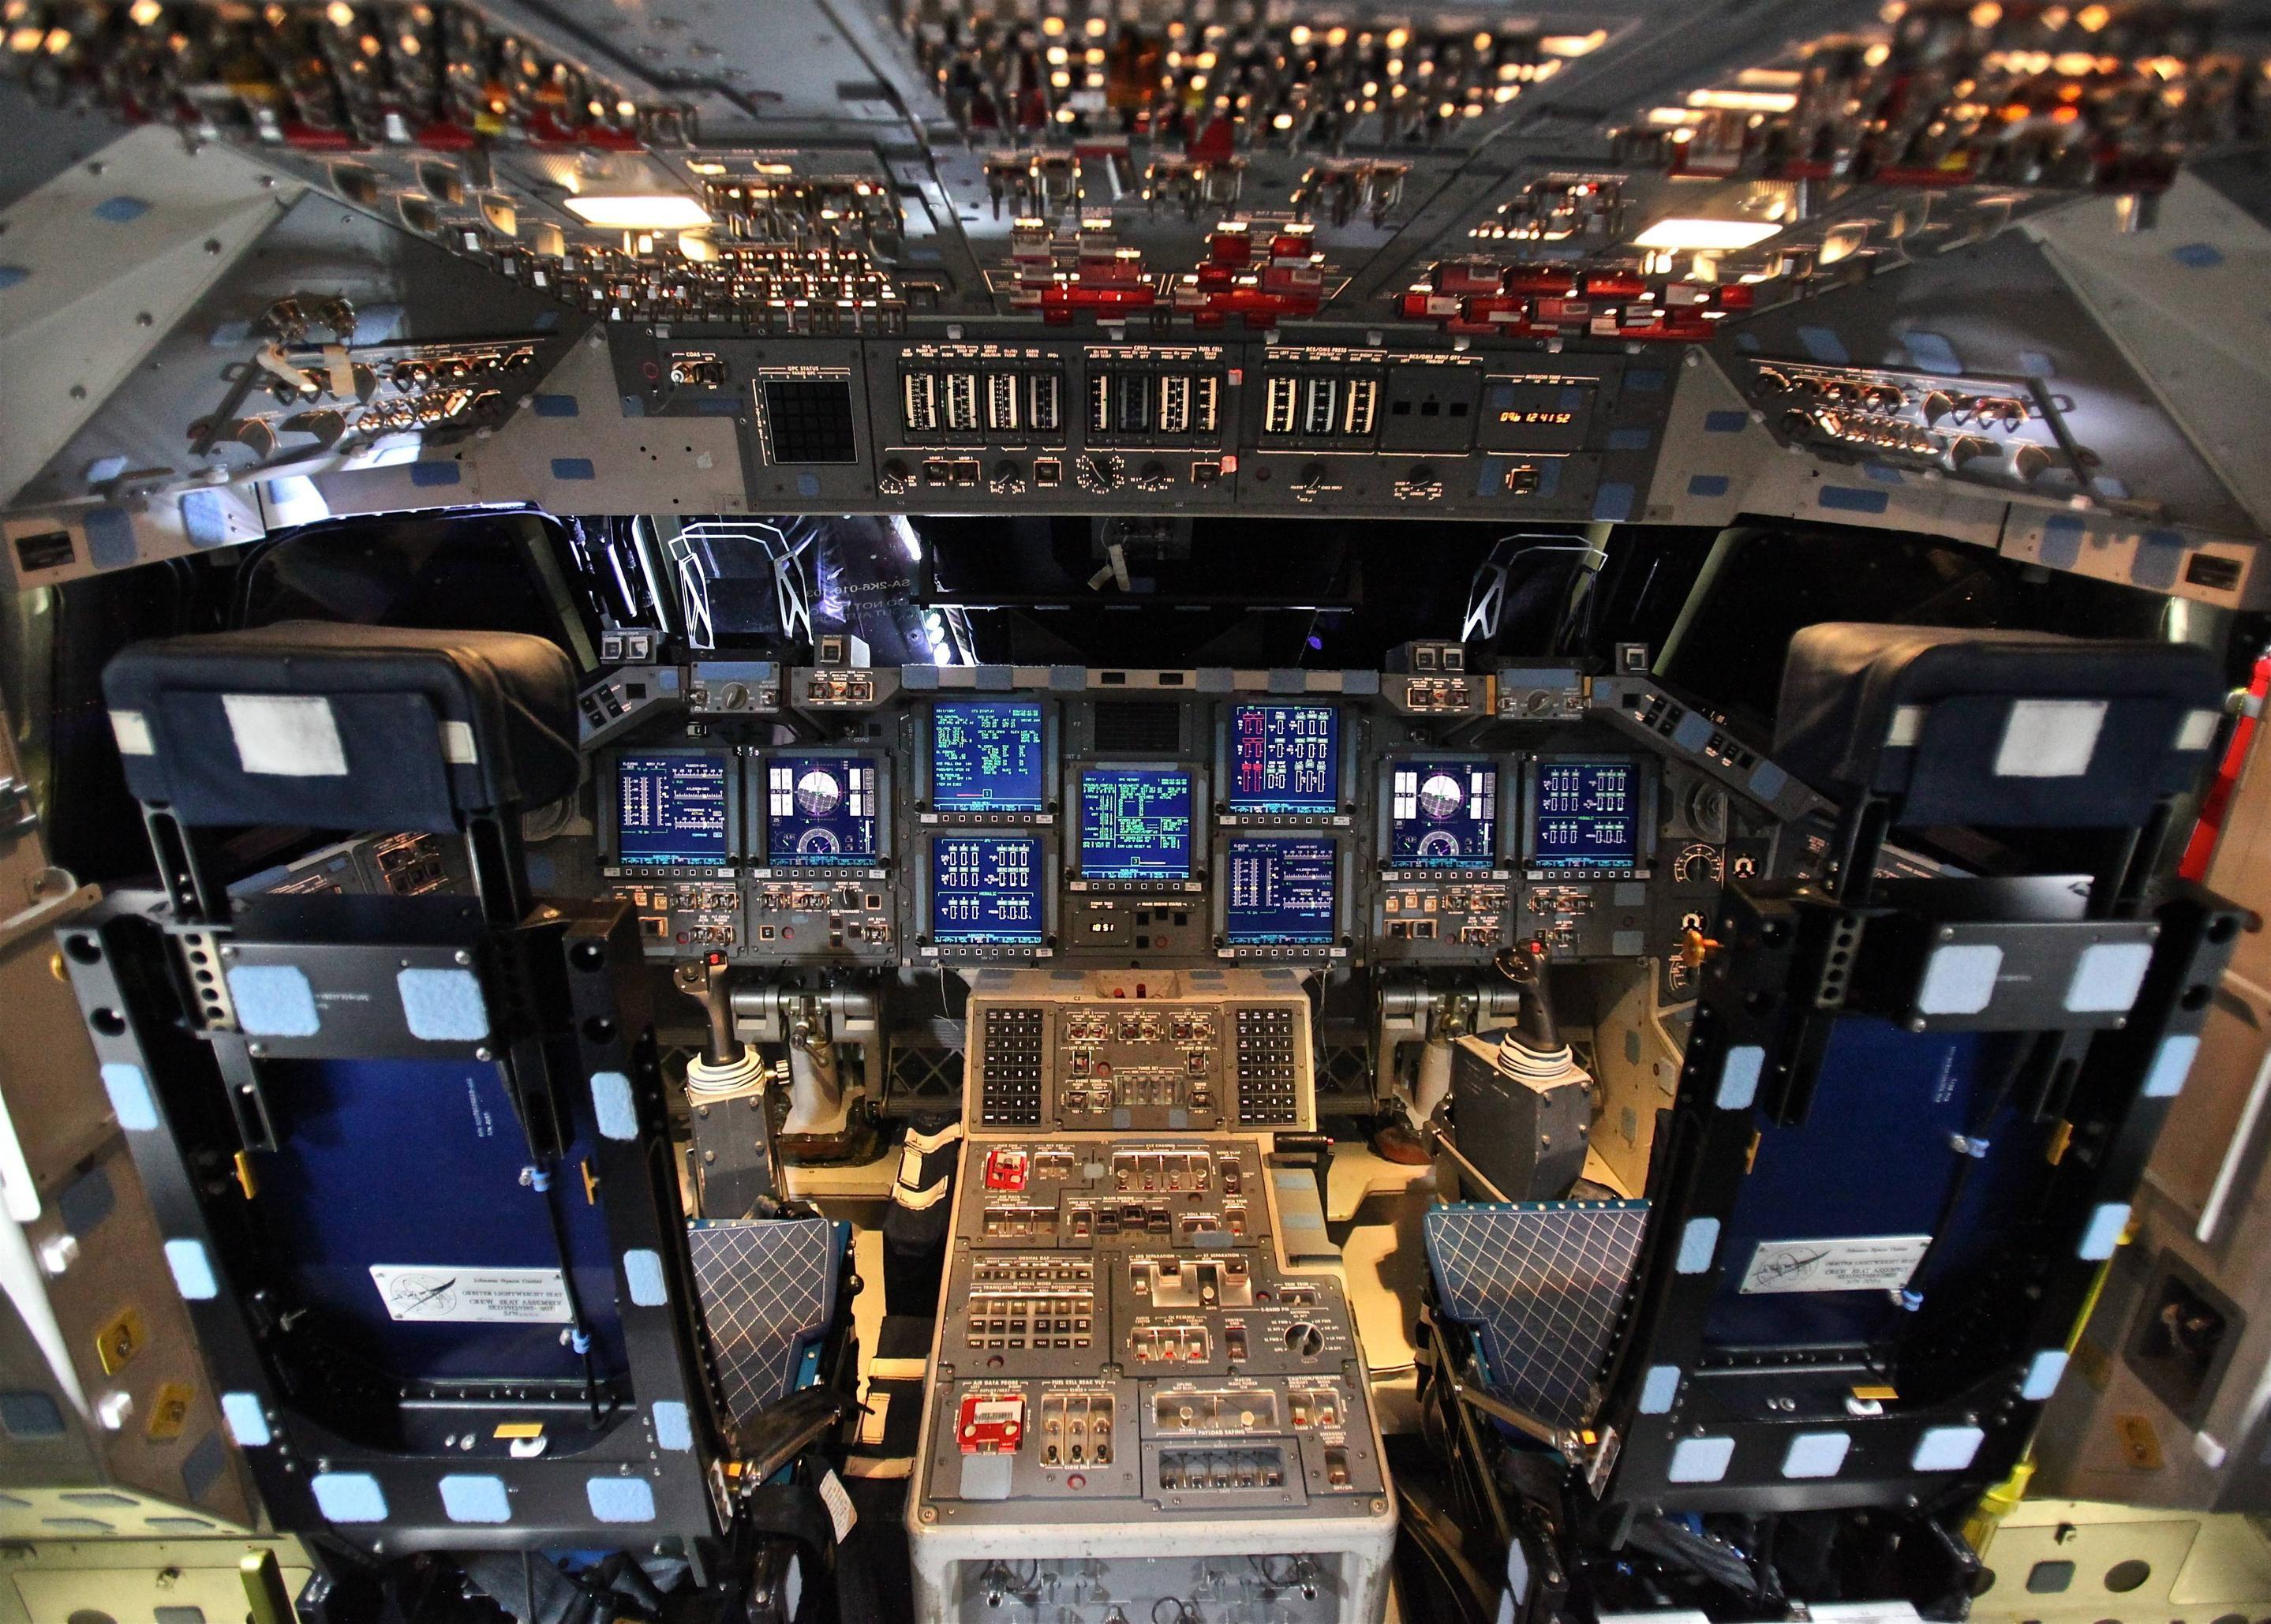 F14A+Cockpit.jpg (1600×1000)   Naval Aviation Aircraft   Pinterest    Aviation and Aircraft